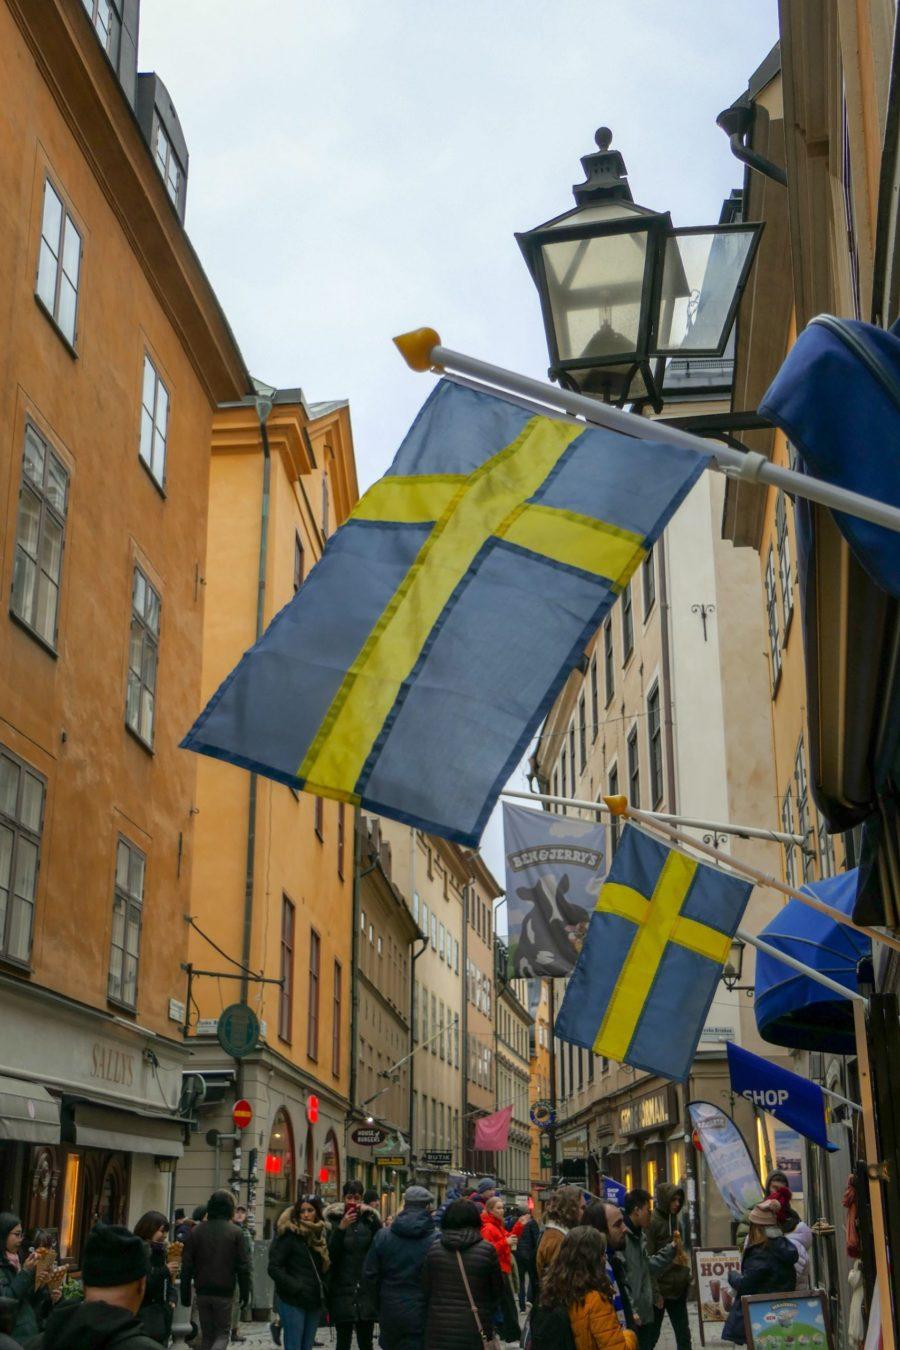 Stockholm Schweden Gamla Stan Stadsholmen Altstadt Gasse Schwedische Fahne